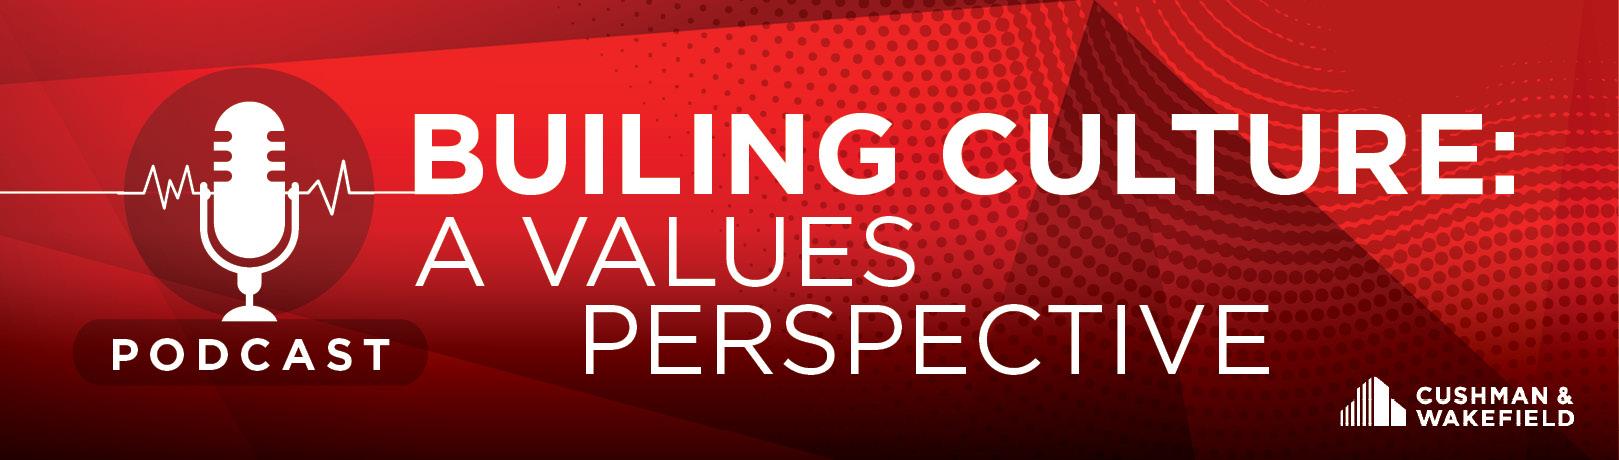 Building Culture (image)